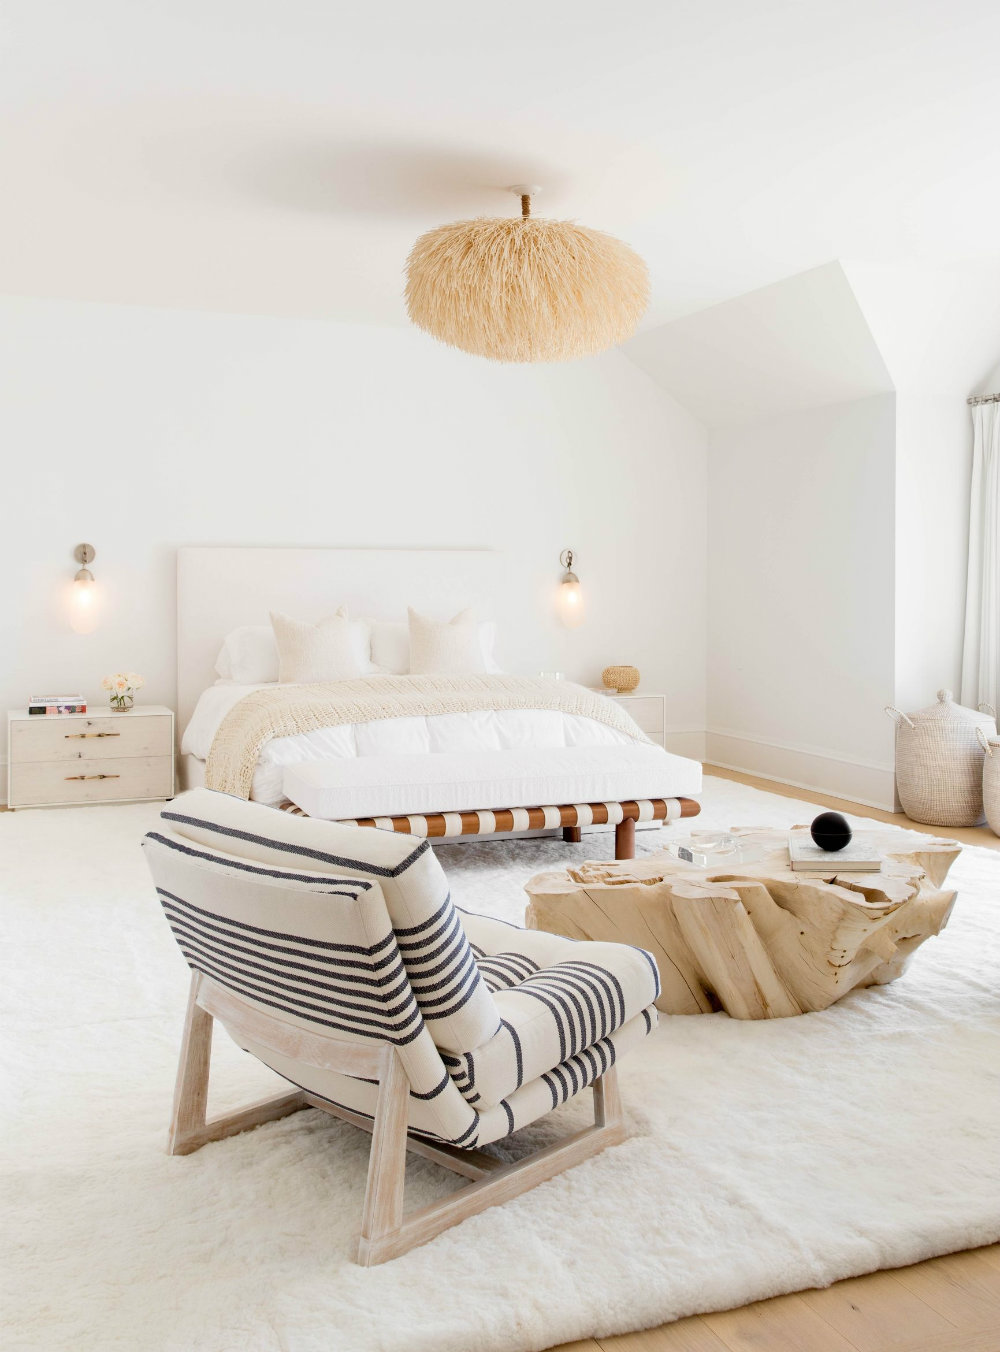 Bedroom Design Ideas From Top Interior Designers 03 Bedroom Design Ideas Bedroom Design Ideas From Top Interior Designers Bedroom Design Ideas From Top Interior Designers 03